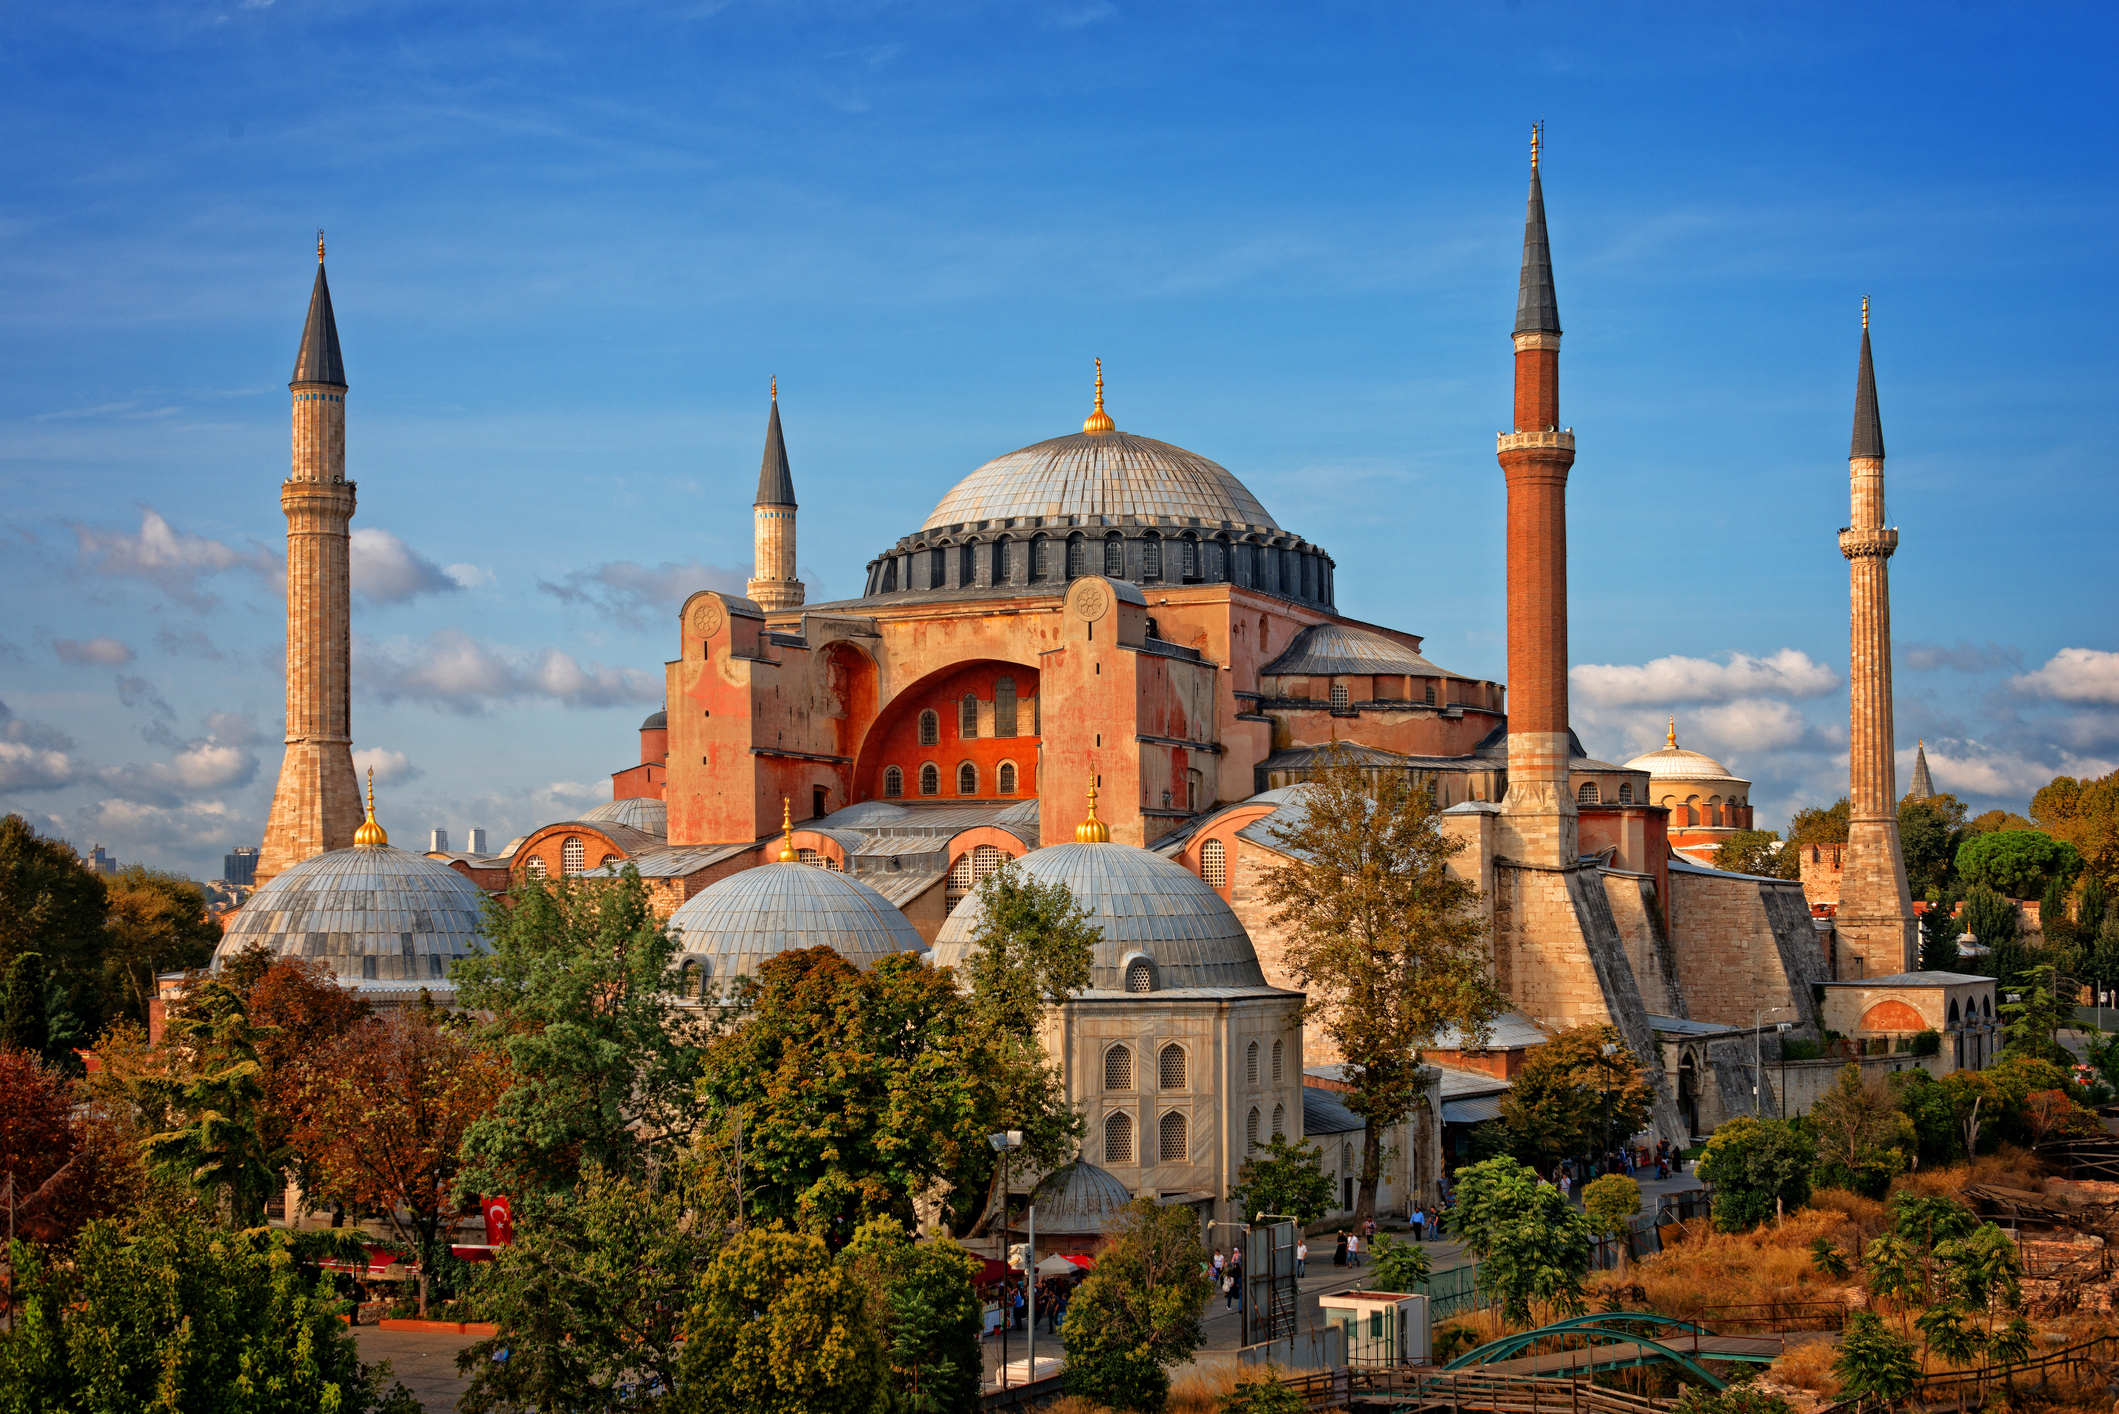 Istanbul's Hagia Sophia UNESCO World Heritage Site